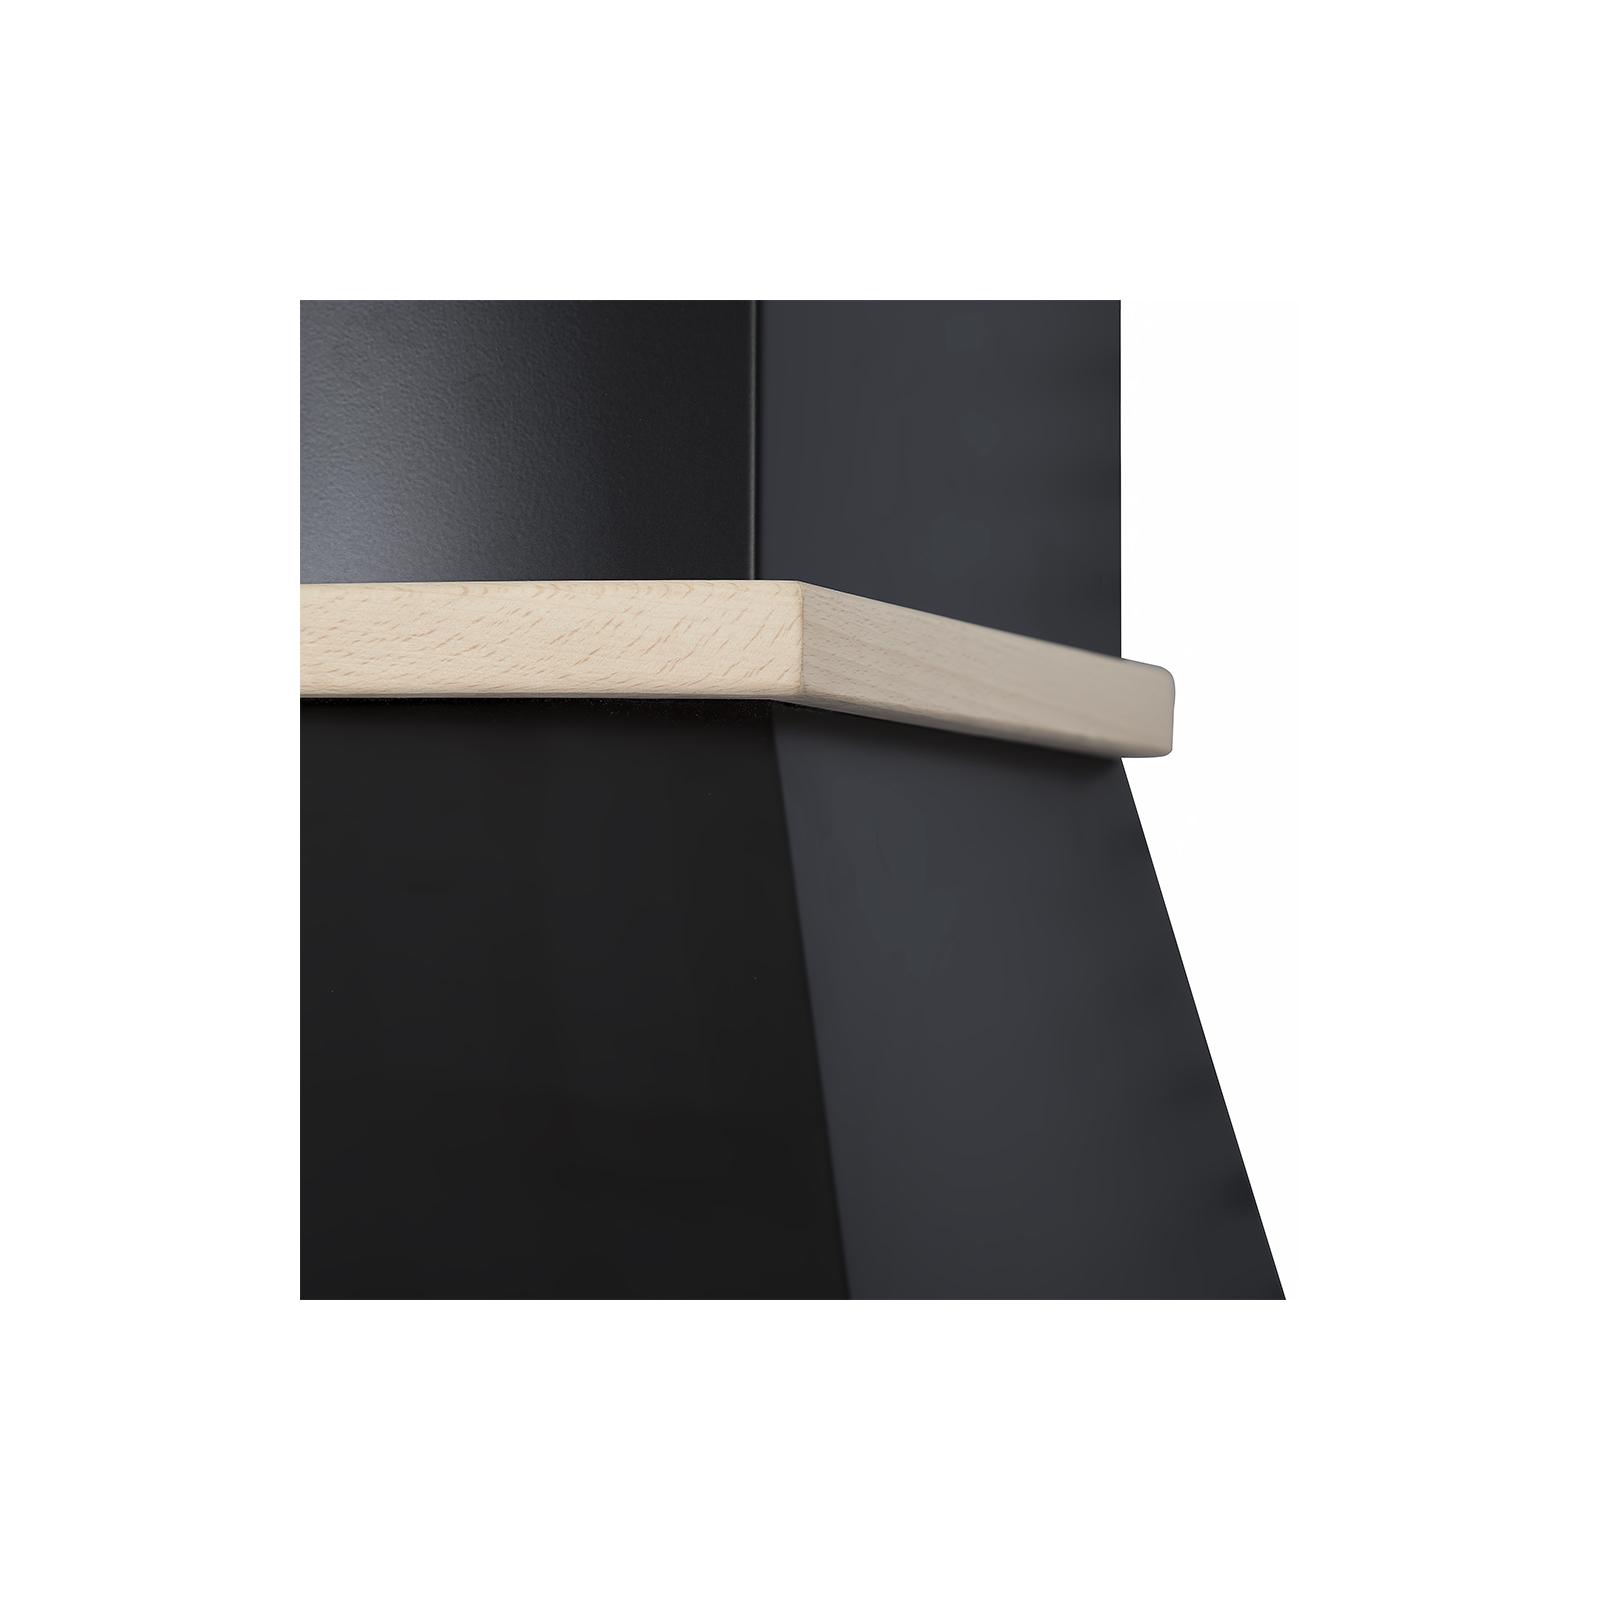 Вытяжка кухонная PERFELLI K 614 Black Country LED изображение 4